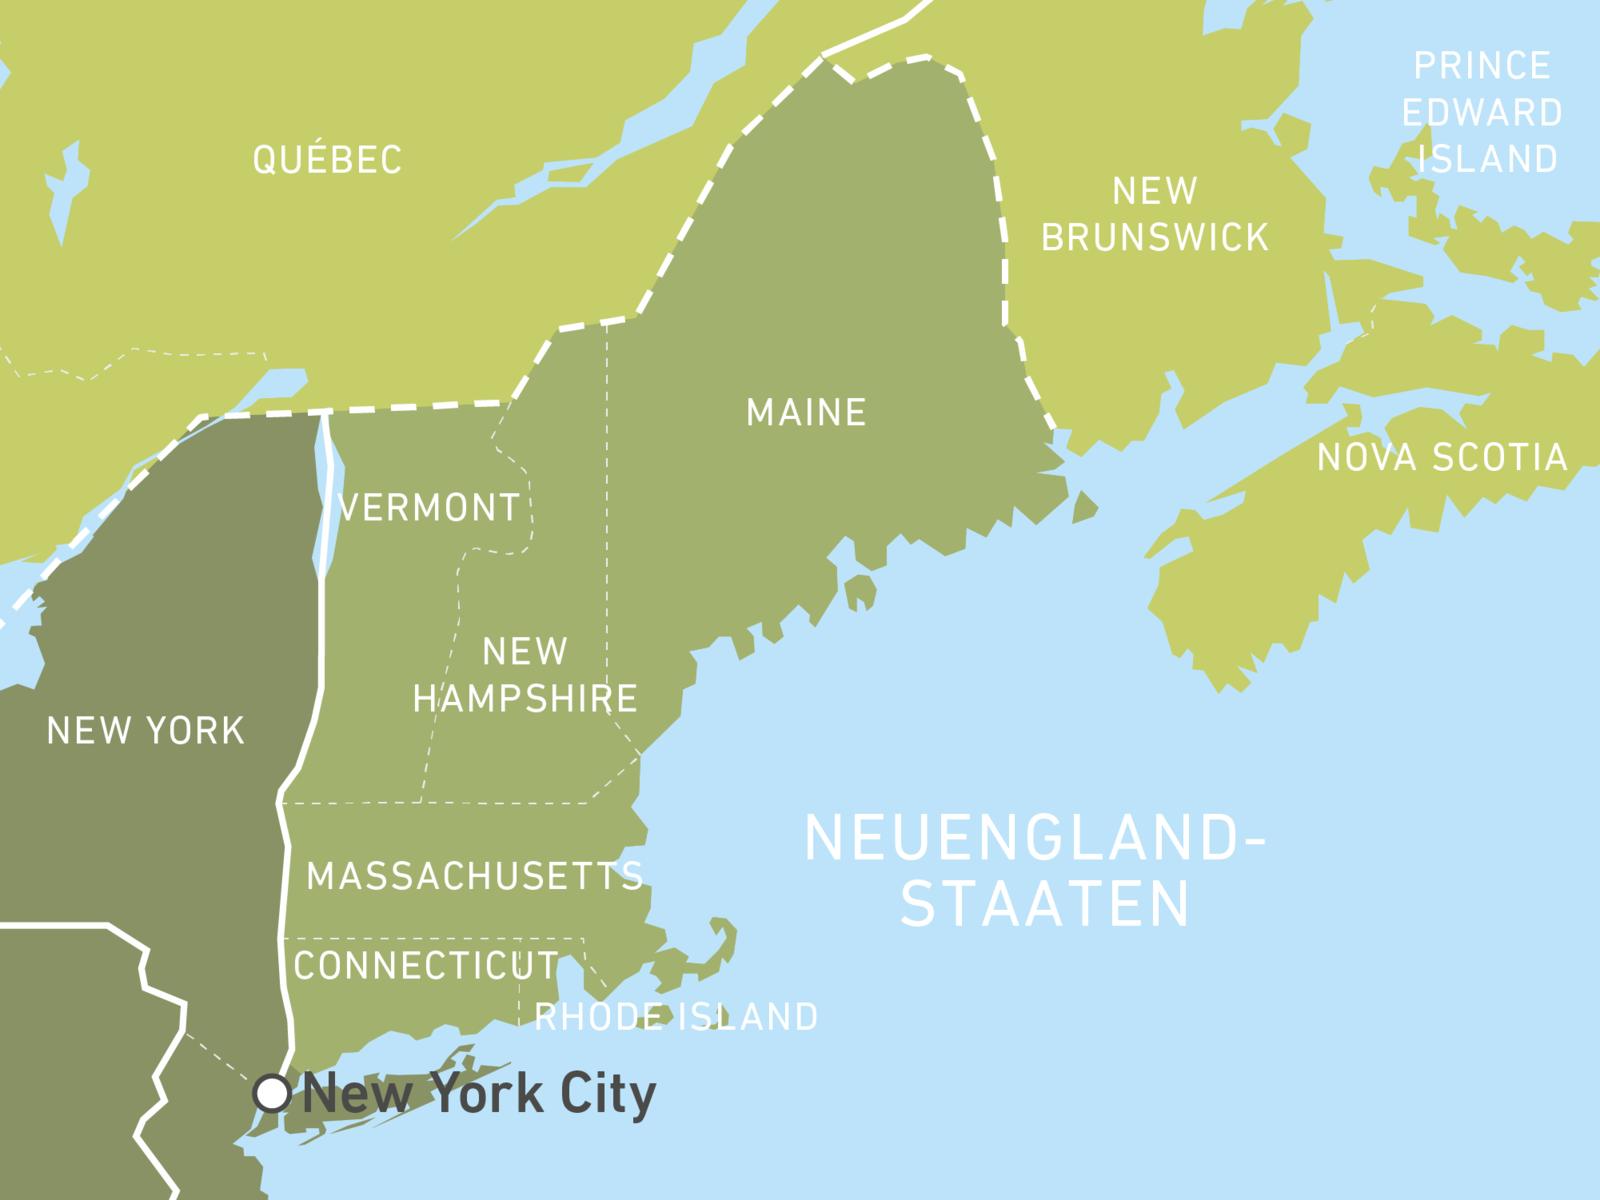 Neuengland-Staaten